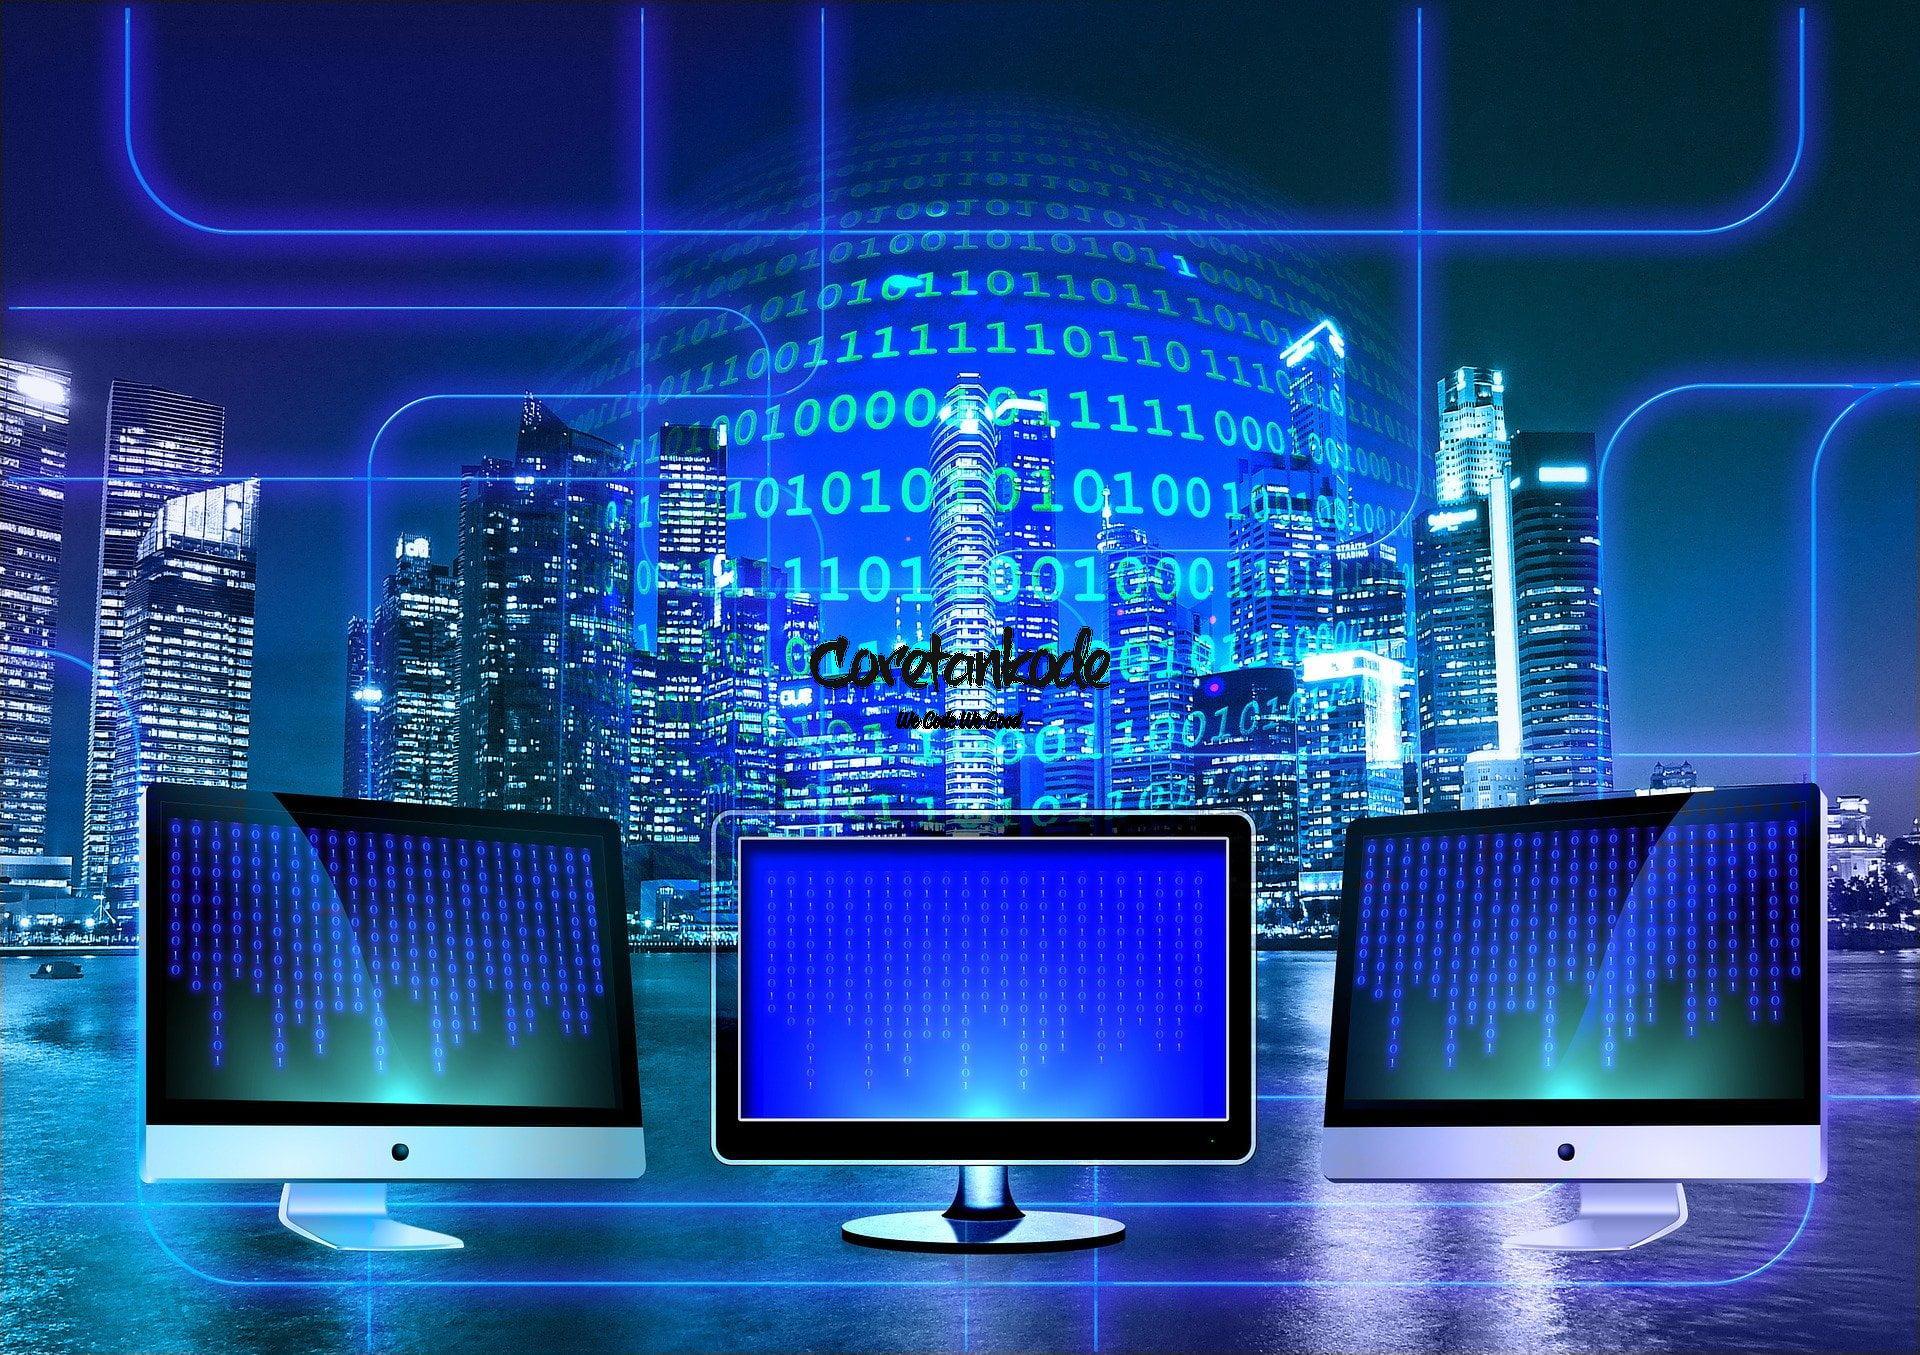 Cara Membersihkan Virus SALITY dilaptop